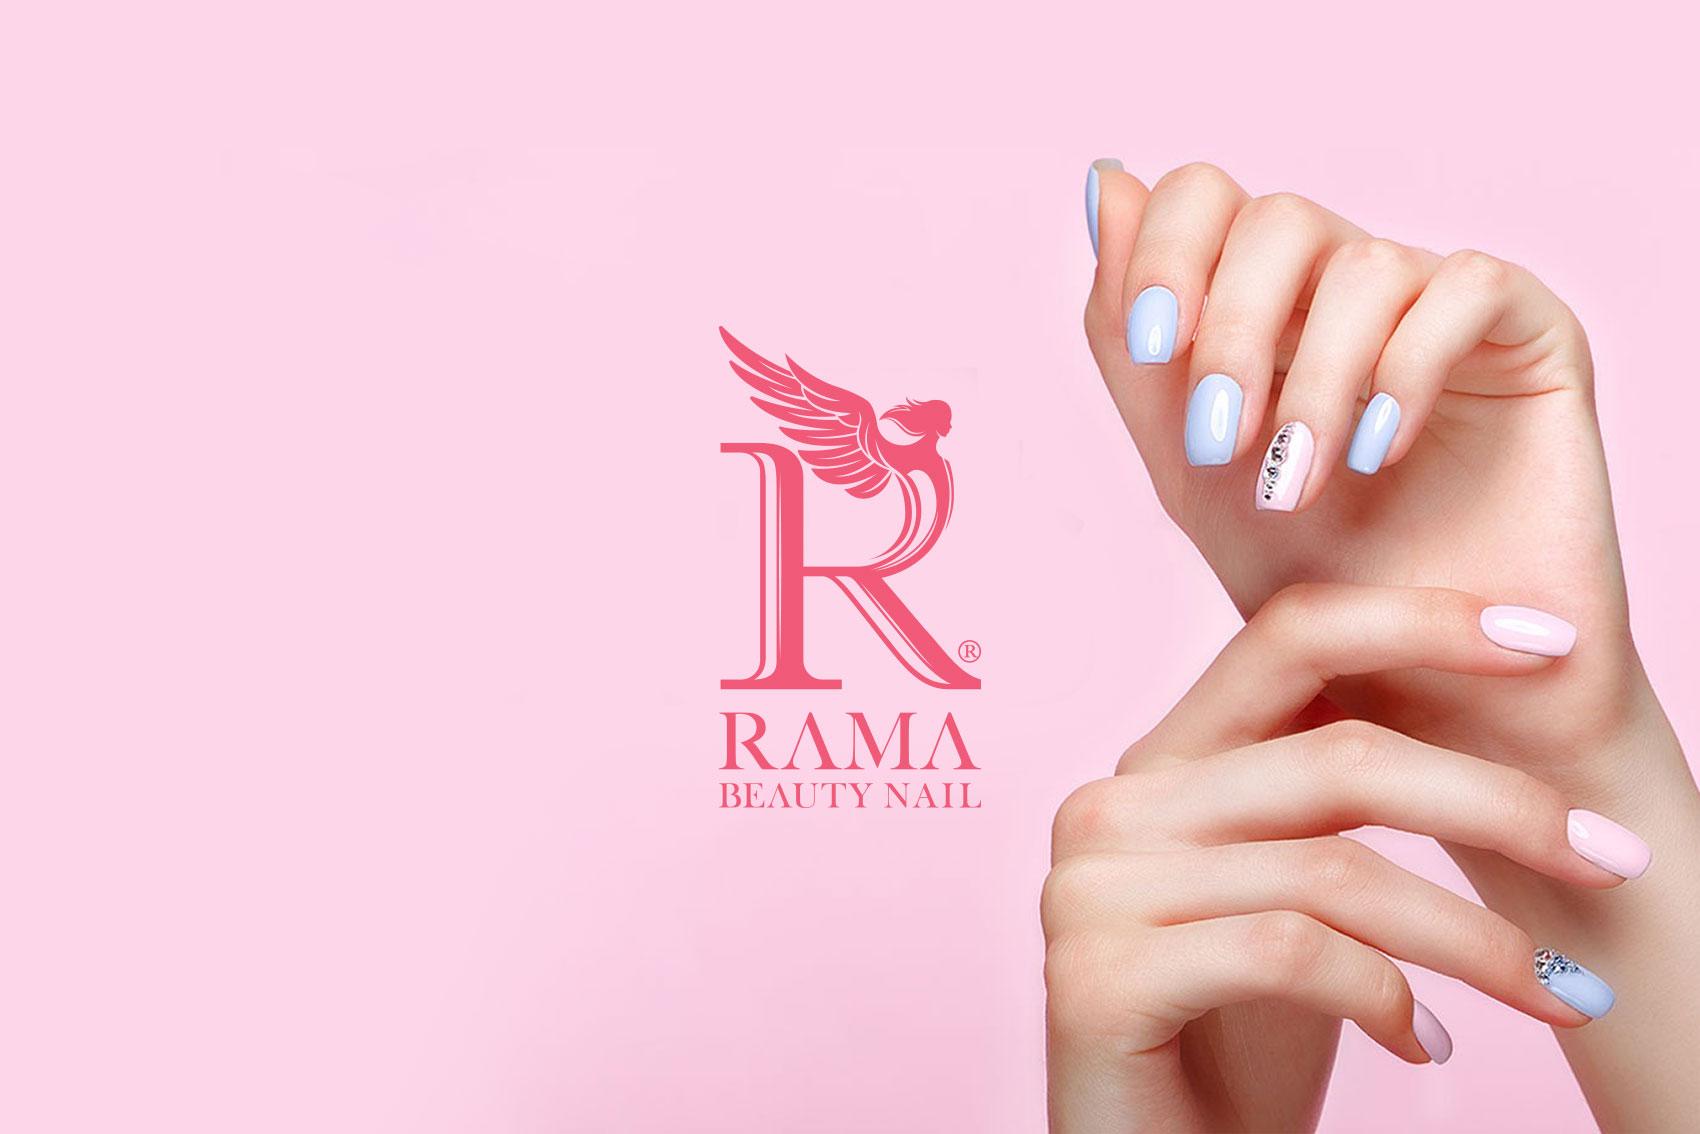 Rama Beauty Nail